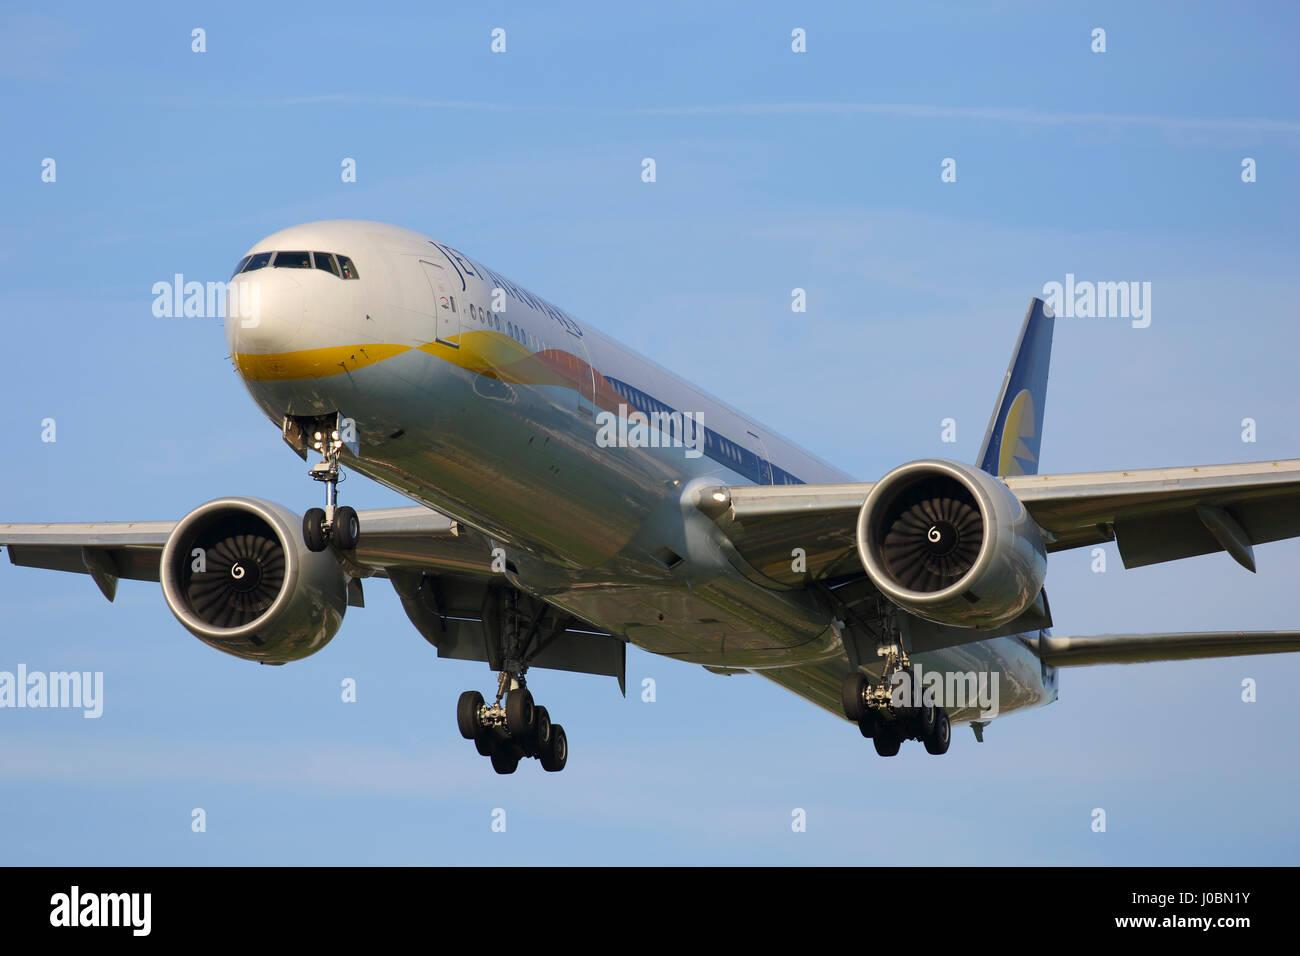 VT-JEV Jet Airways Boeing 777-300 cn 35158 / 637 arriving at London Heathrow airport - Stock Image